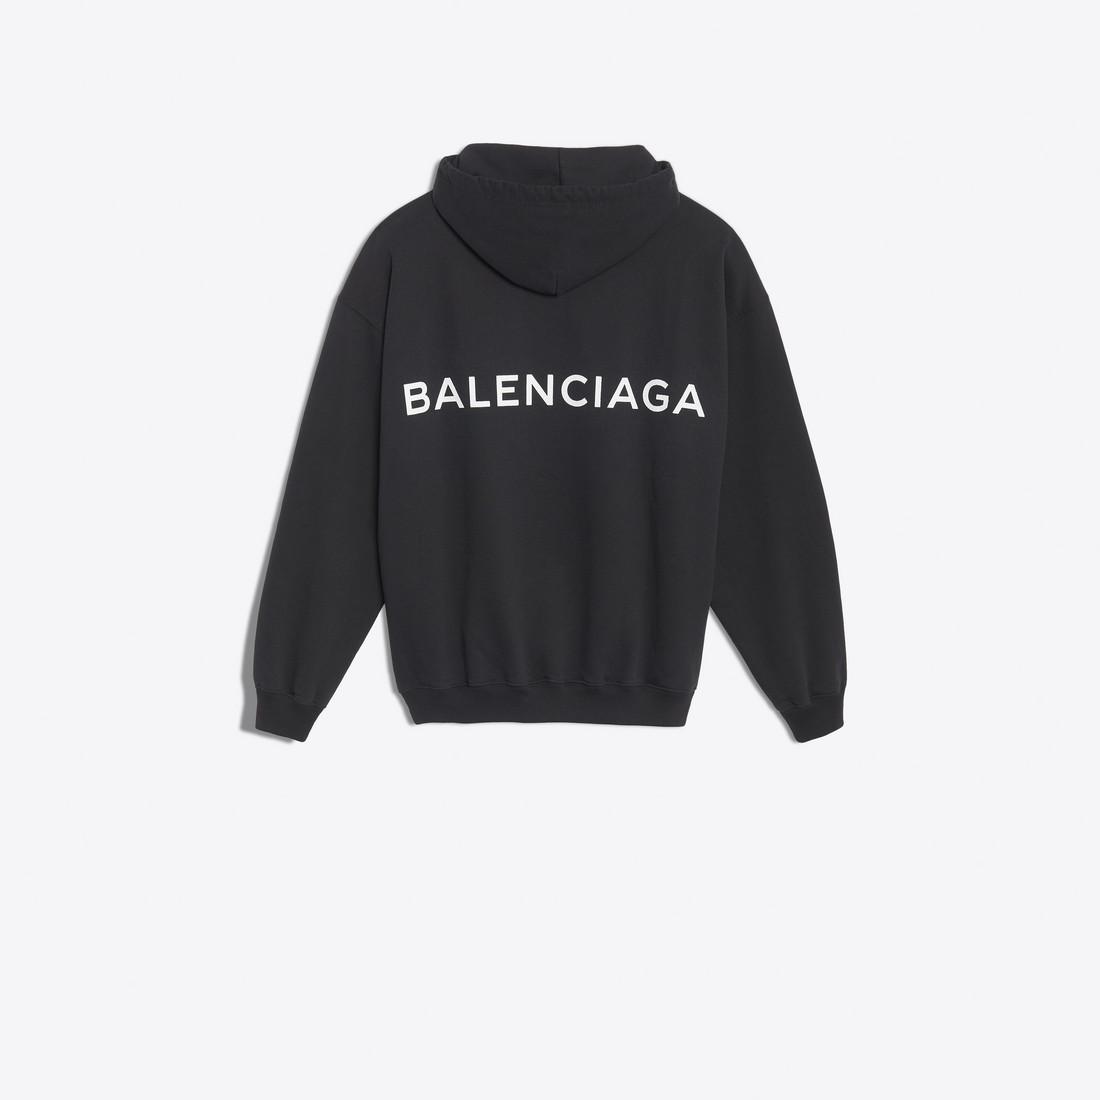 BALENCIAGA フーディー ブラック